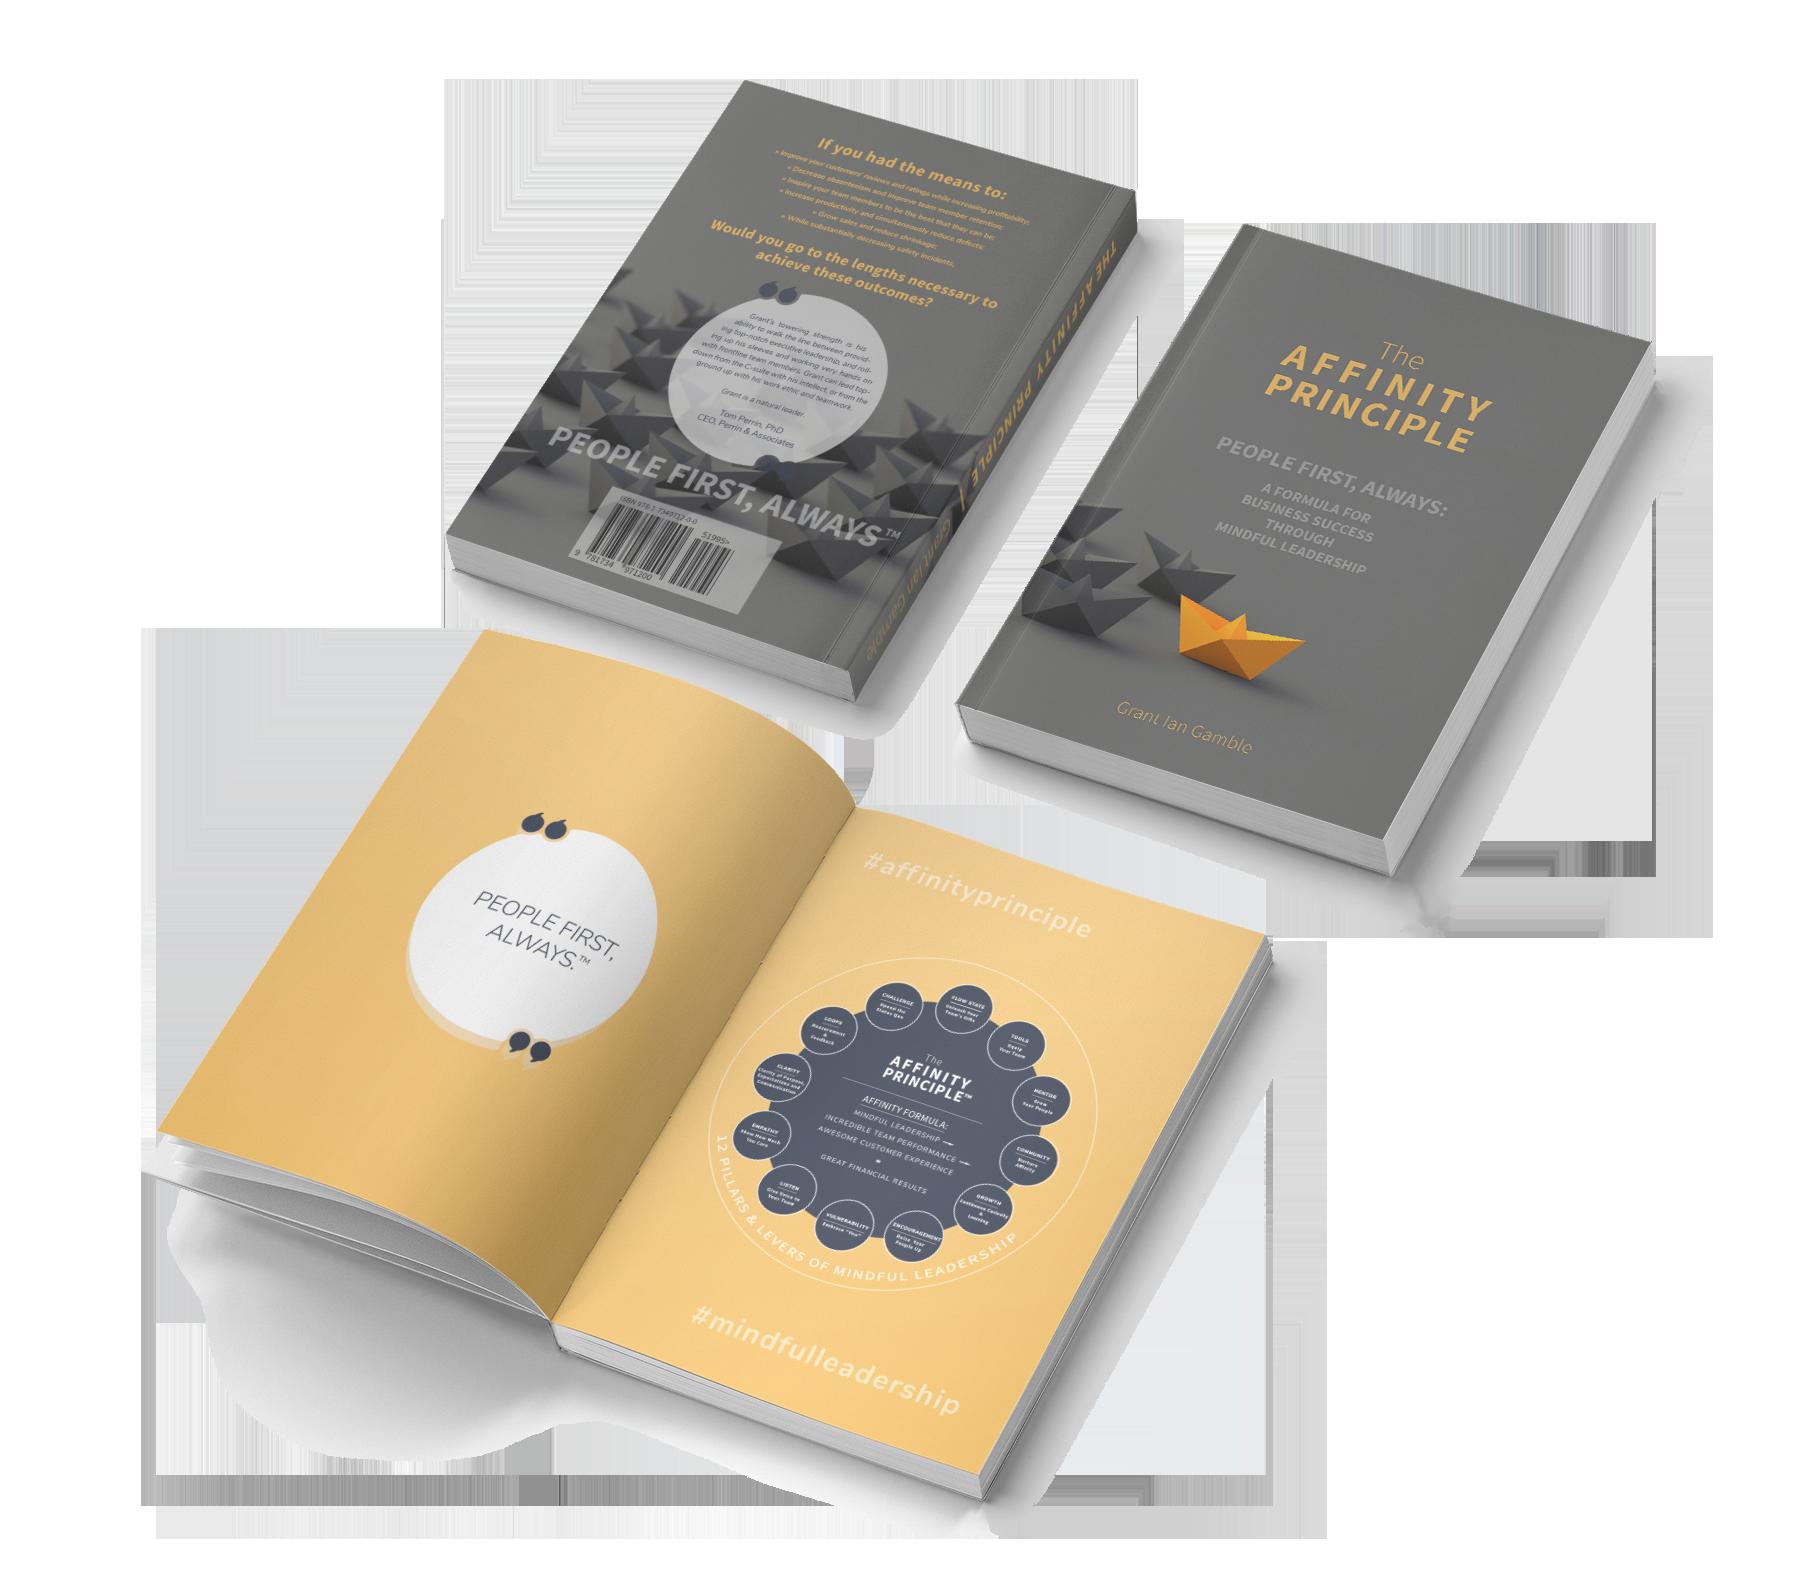 The Affinity Principle | Business Mindful Leadership | Grant Ian Gamble